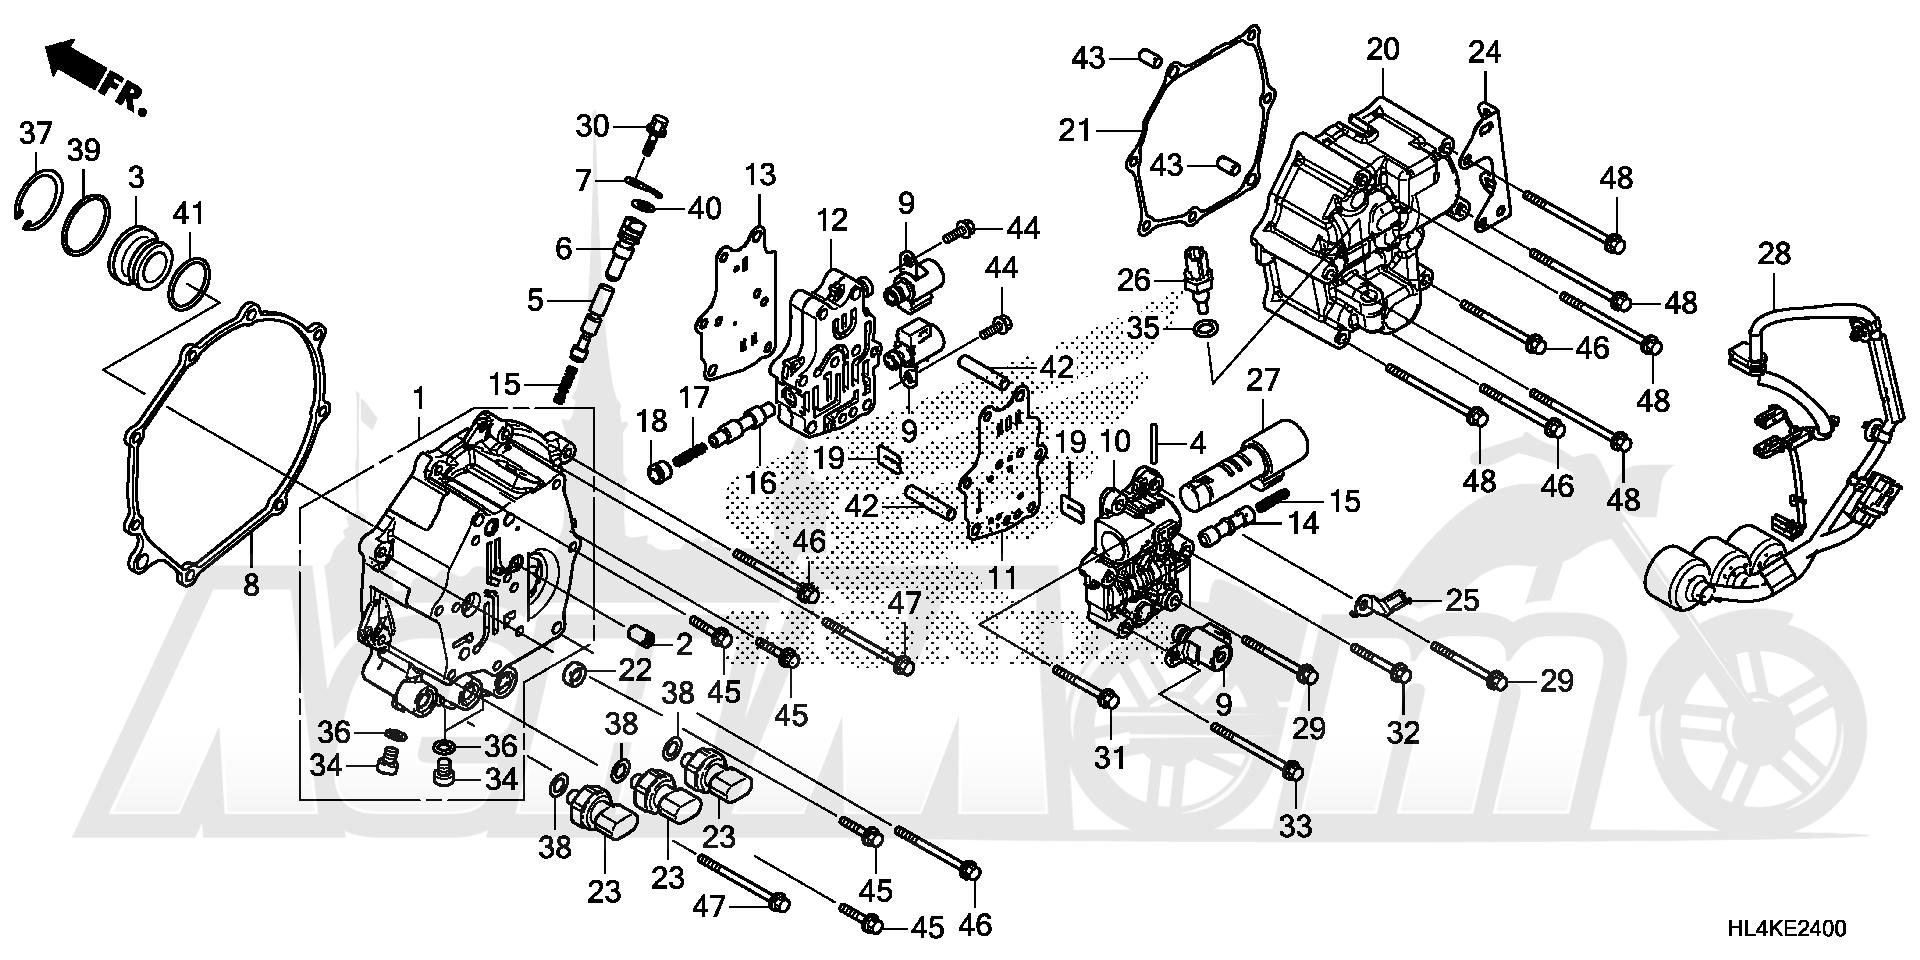 Запчасти для Квадроцикла Honda 2019 SXS1000M5L Раздел: SOLENOID VALVE | реле, соленоид клапан